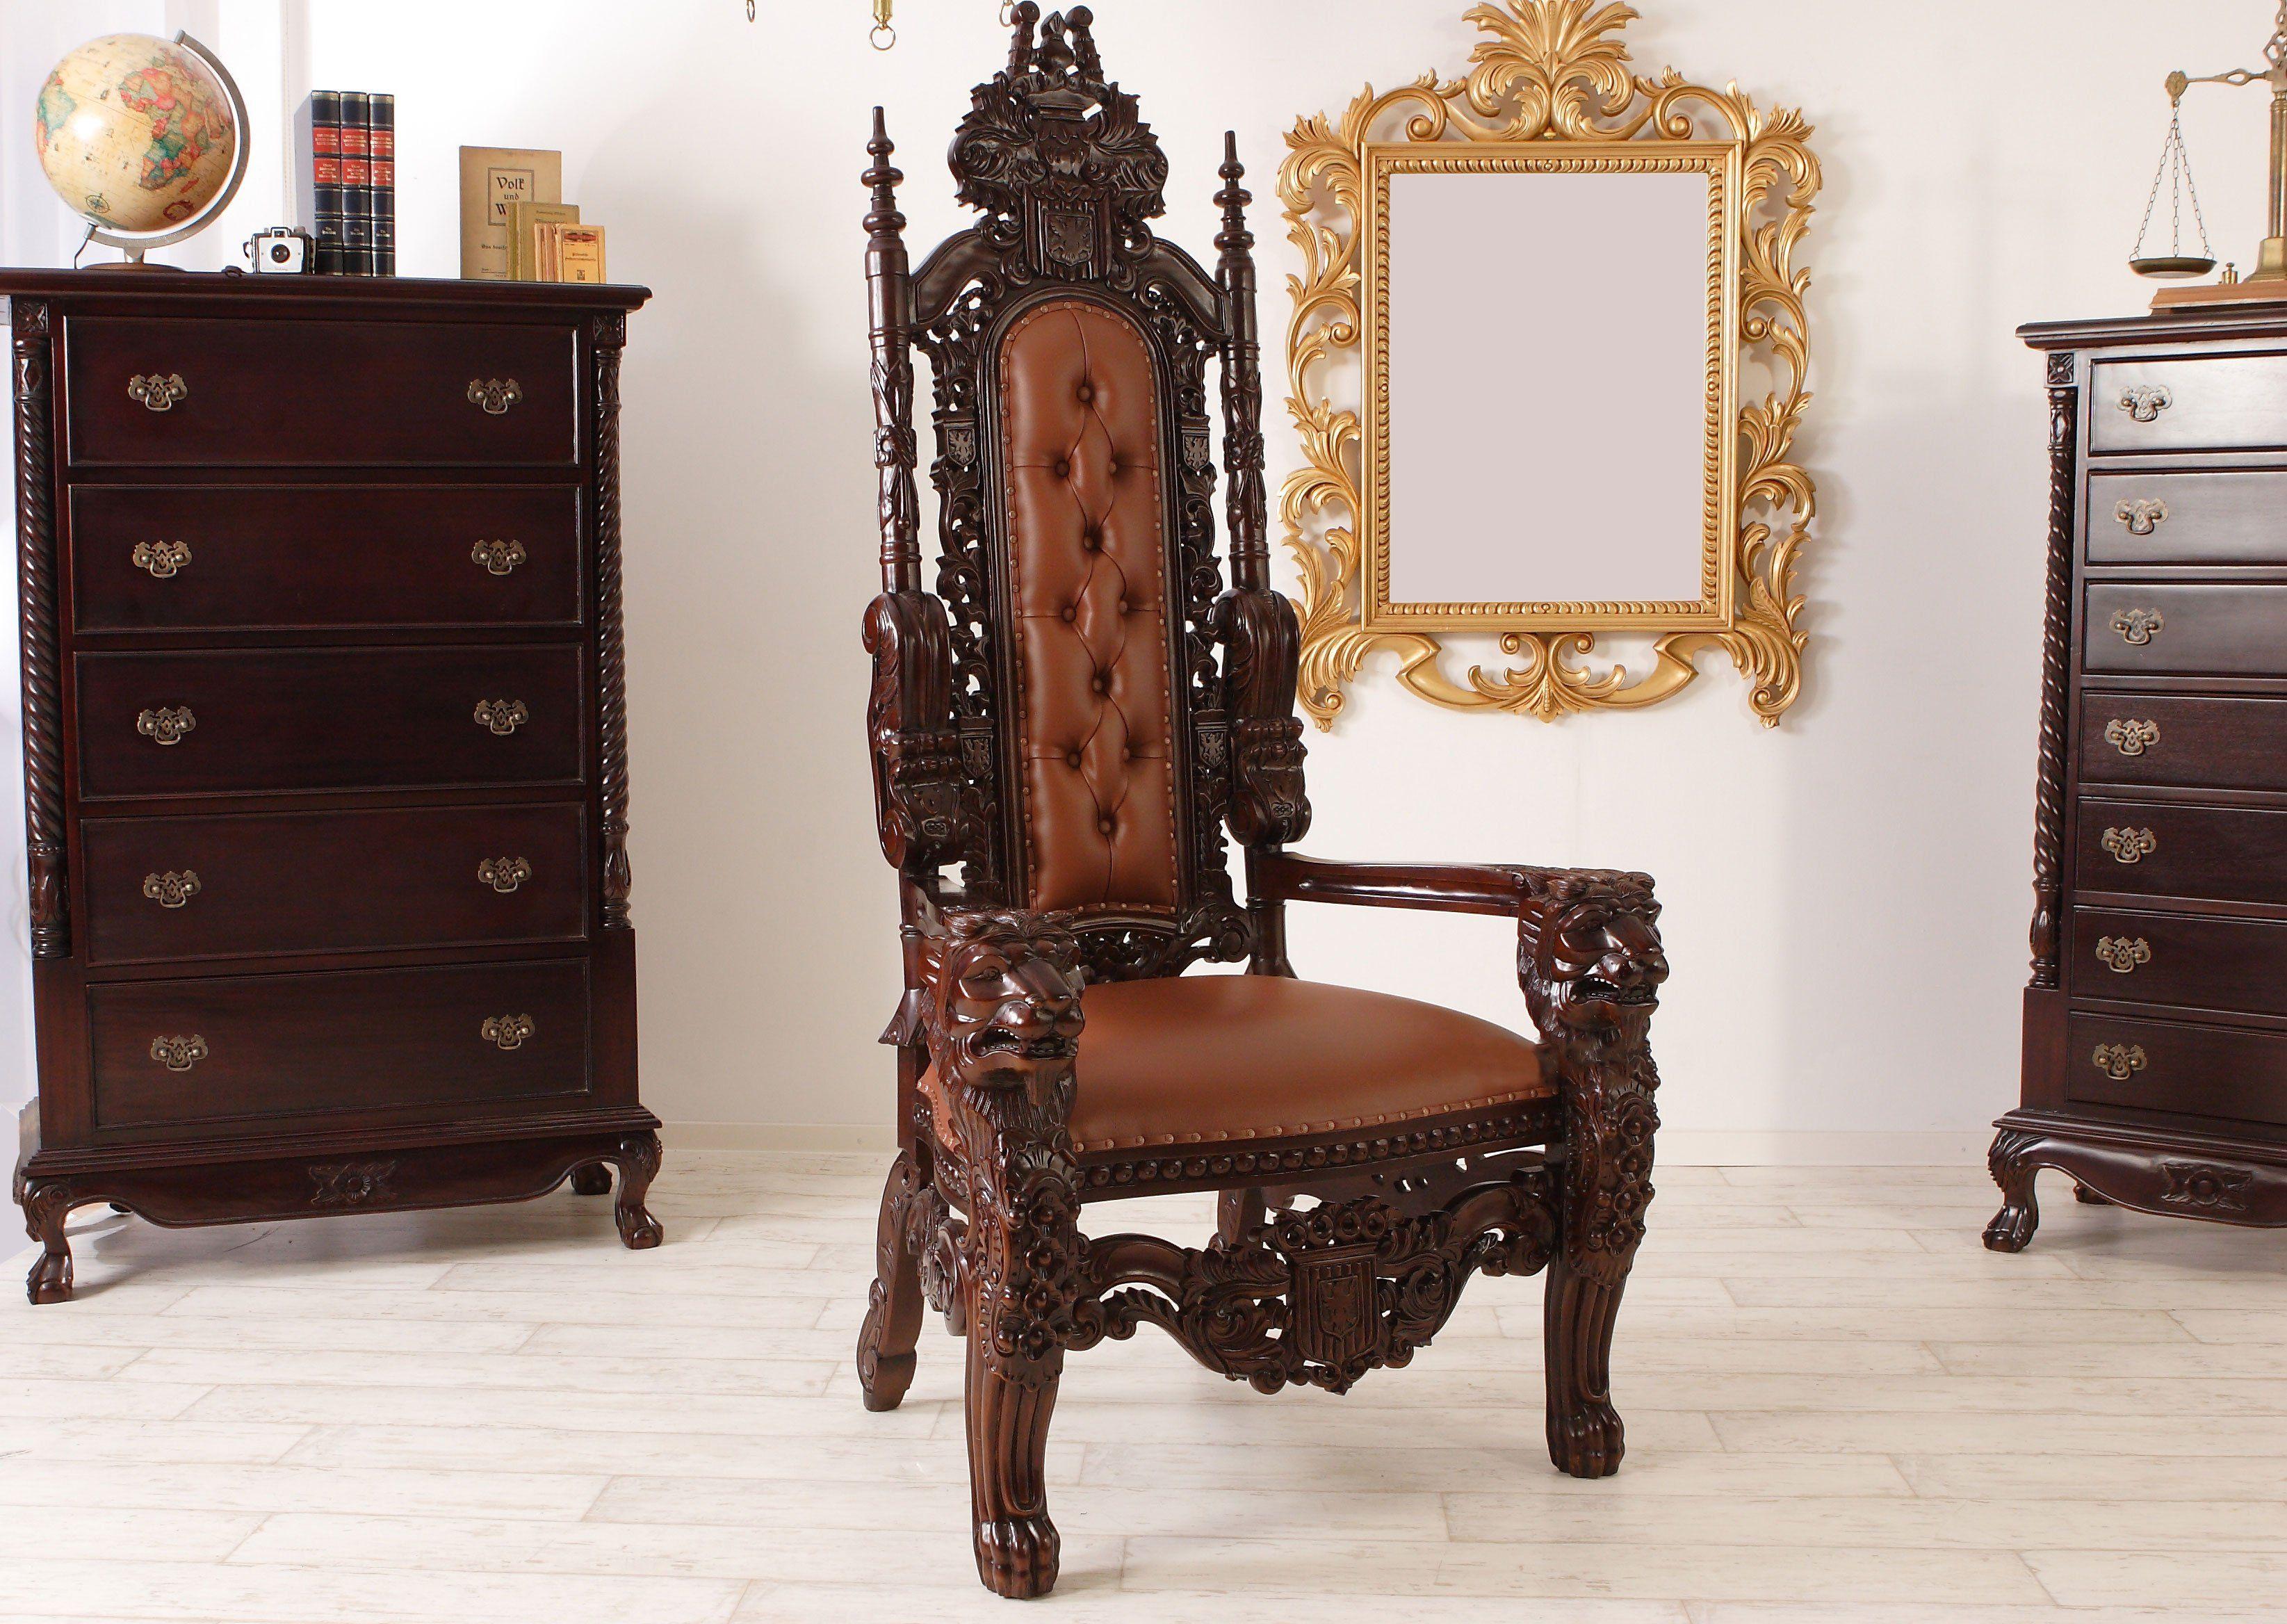 Image result for medieval chair Medieval furniture